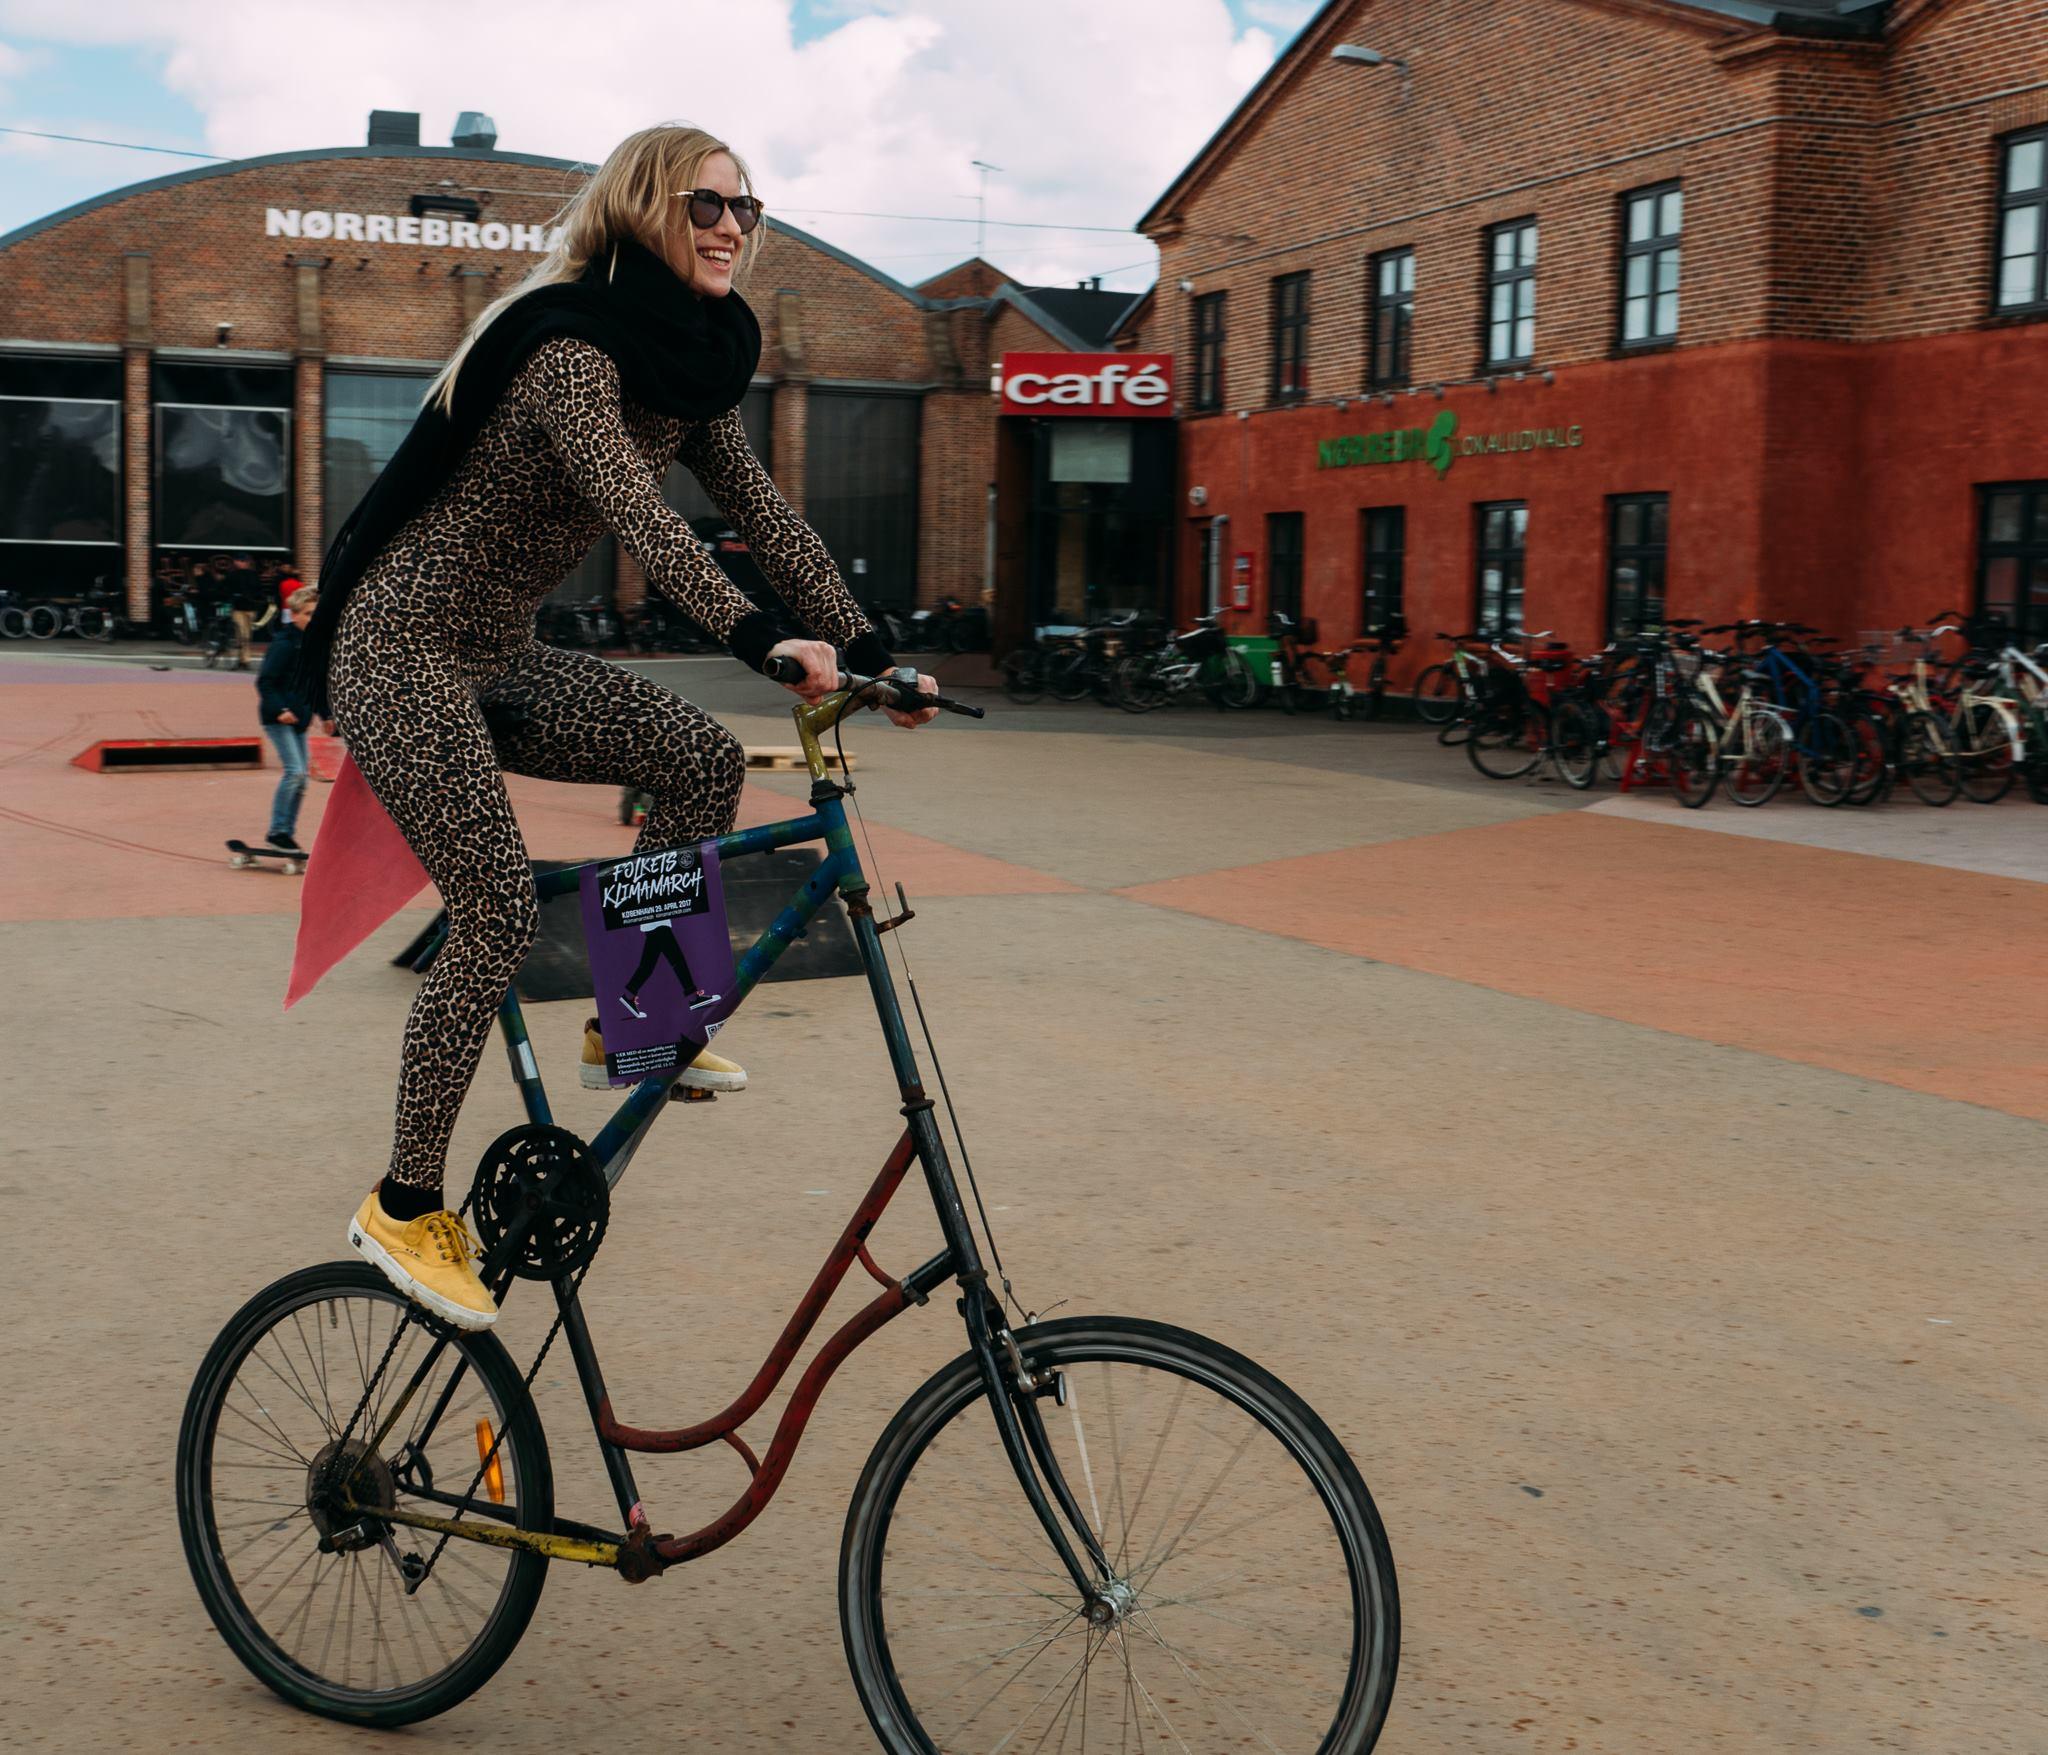 Klimamarch Bike Ride Pre-Event (Photo Credit: Adam Ronan)